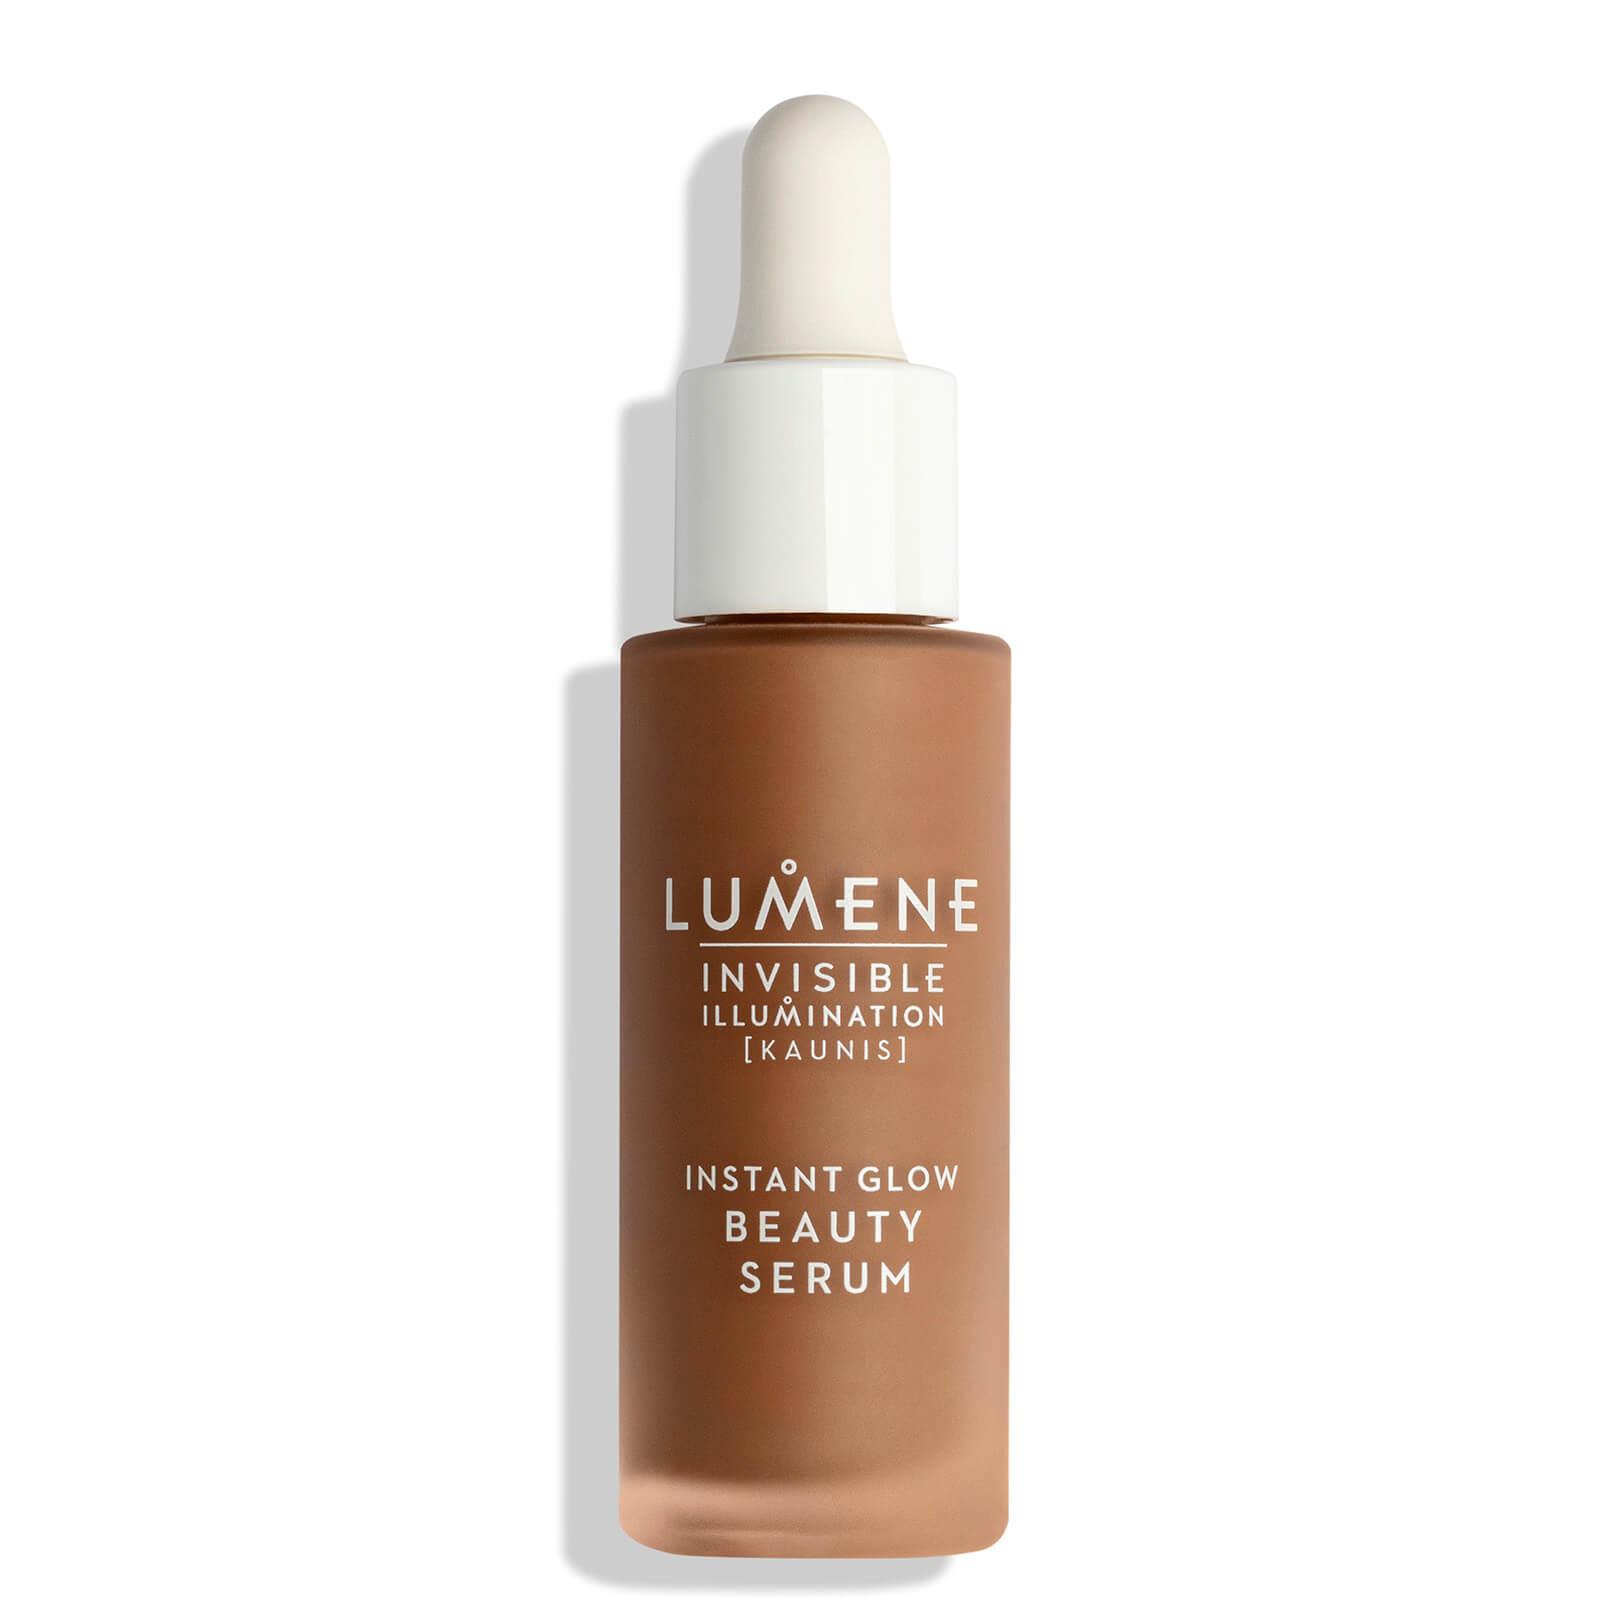 Купить Lumene Invisible Illumination Instant Glow Beauty Serum 30ml